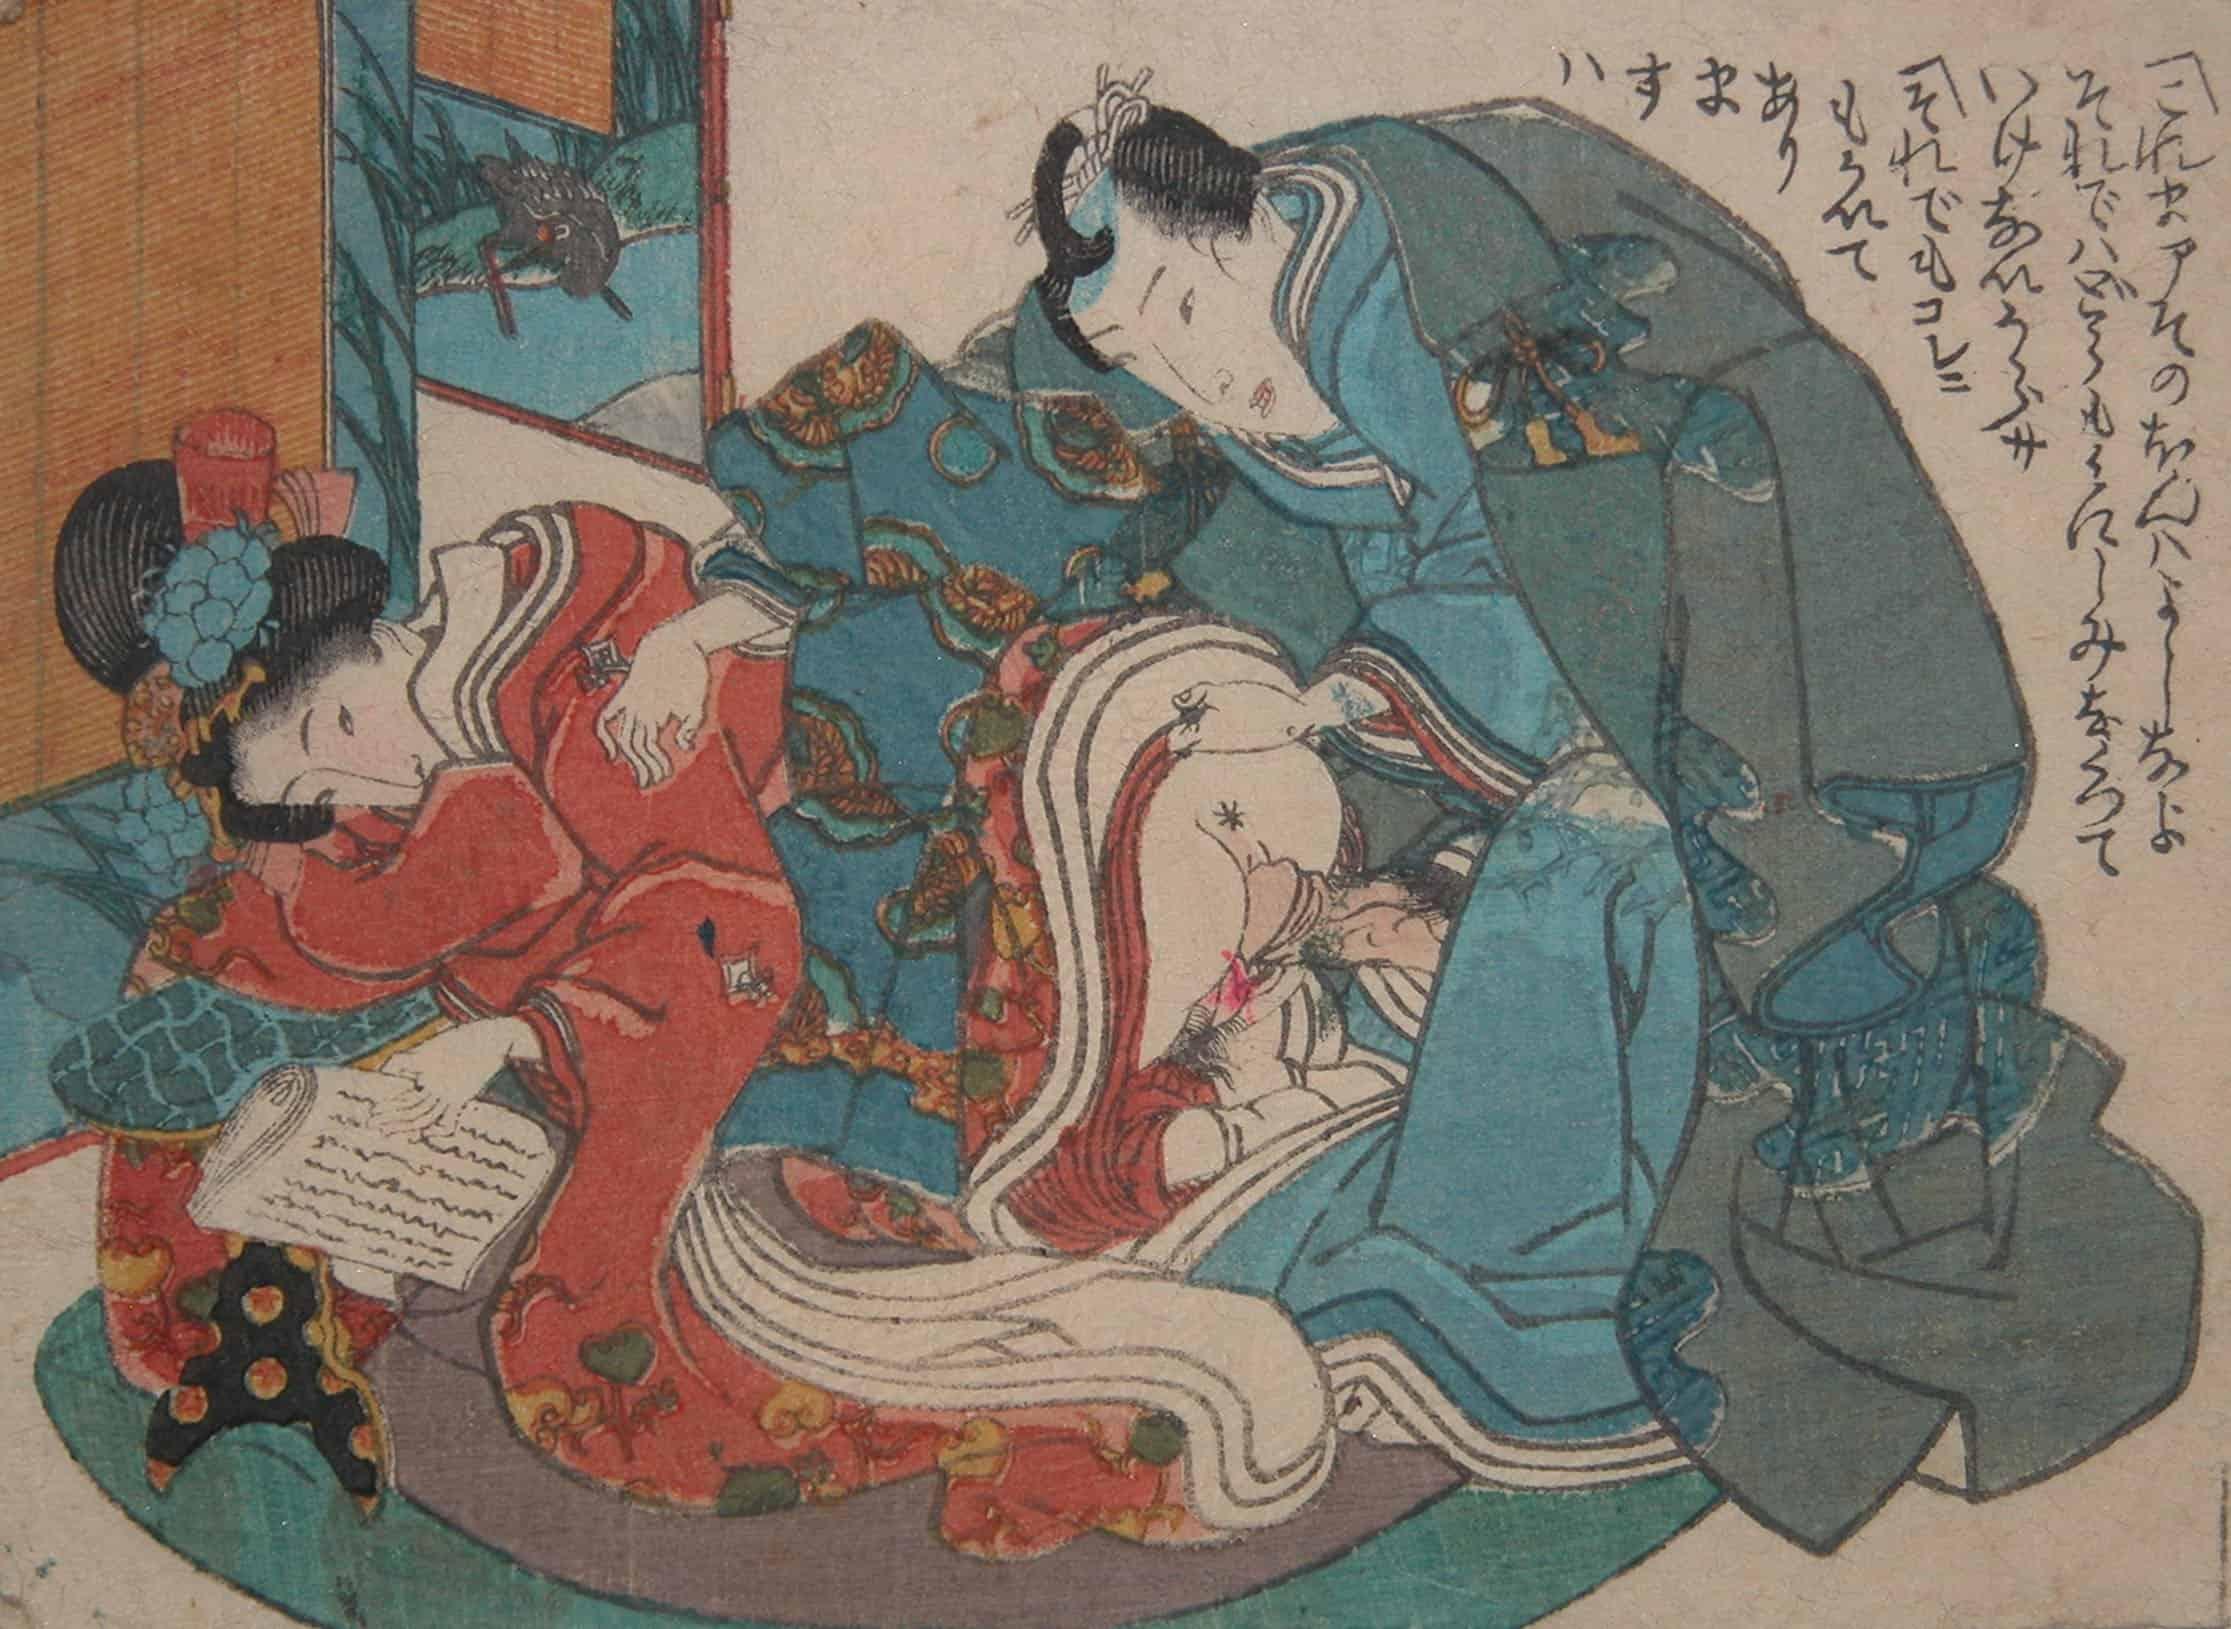 Toyokuni III, The prince and The princess, c.1848, shunga